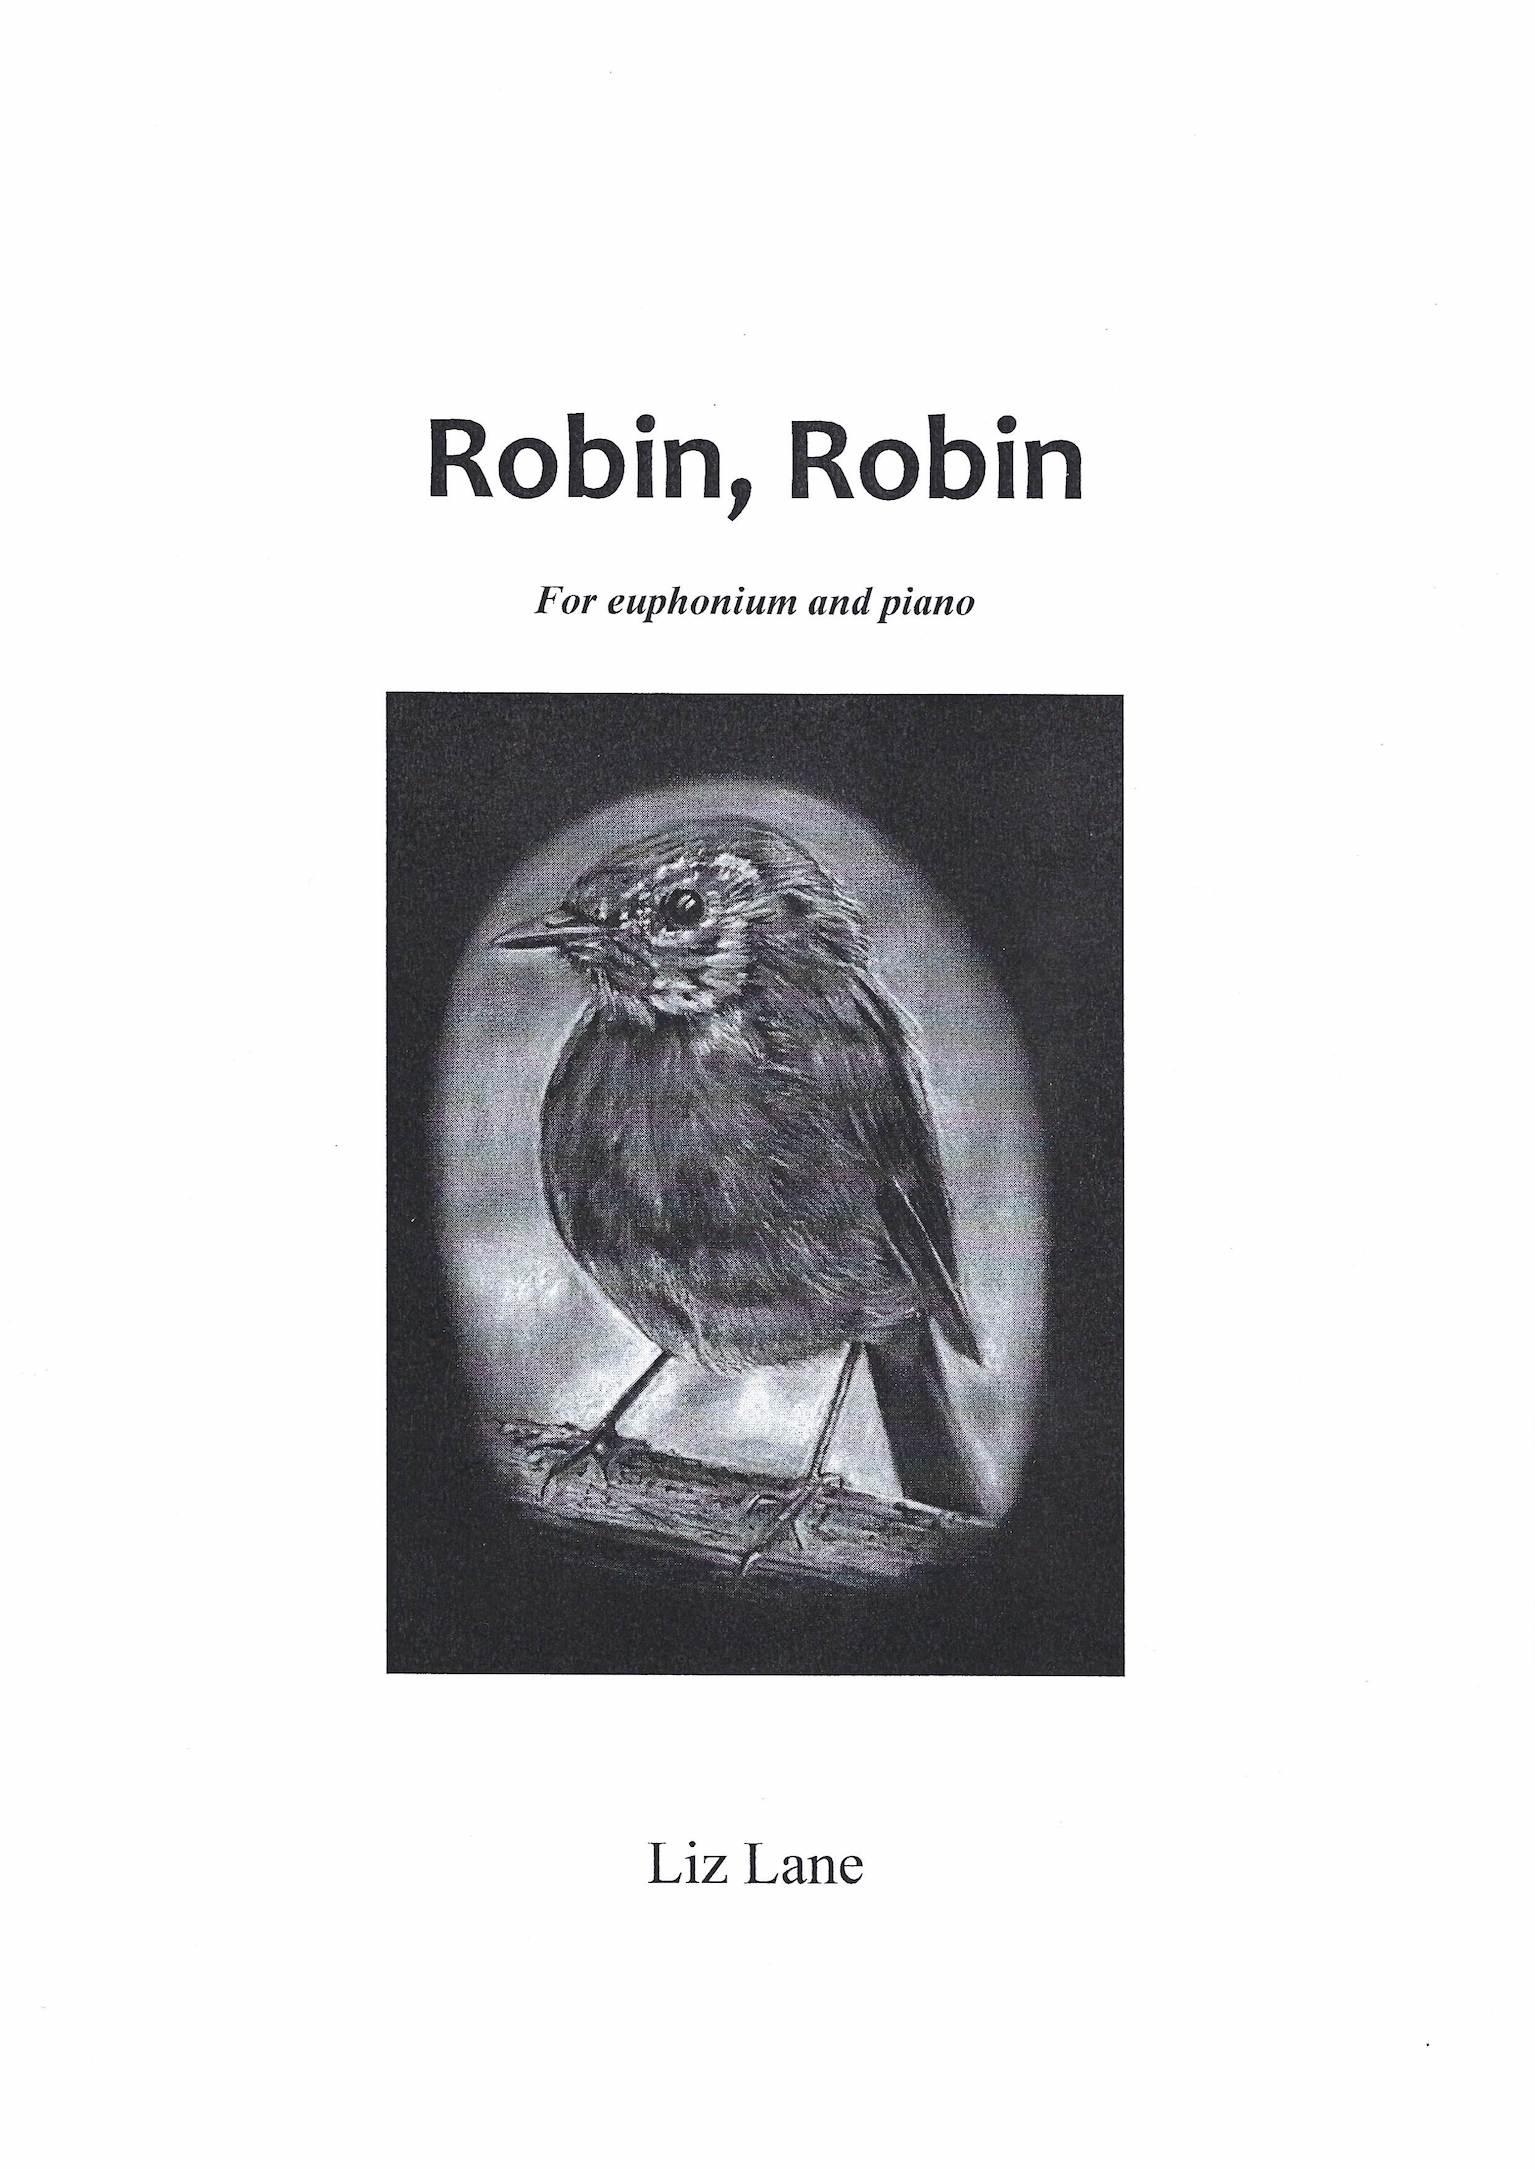 Robin Robin - Liz Lane - Euphonium and Piano (TC solo part)